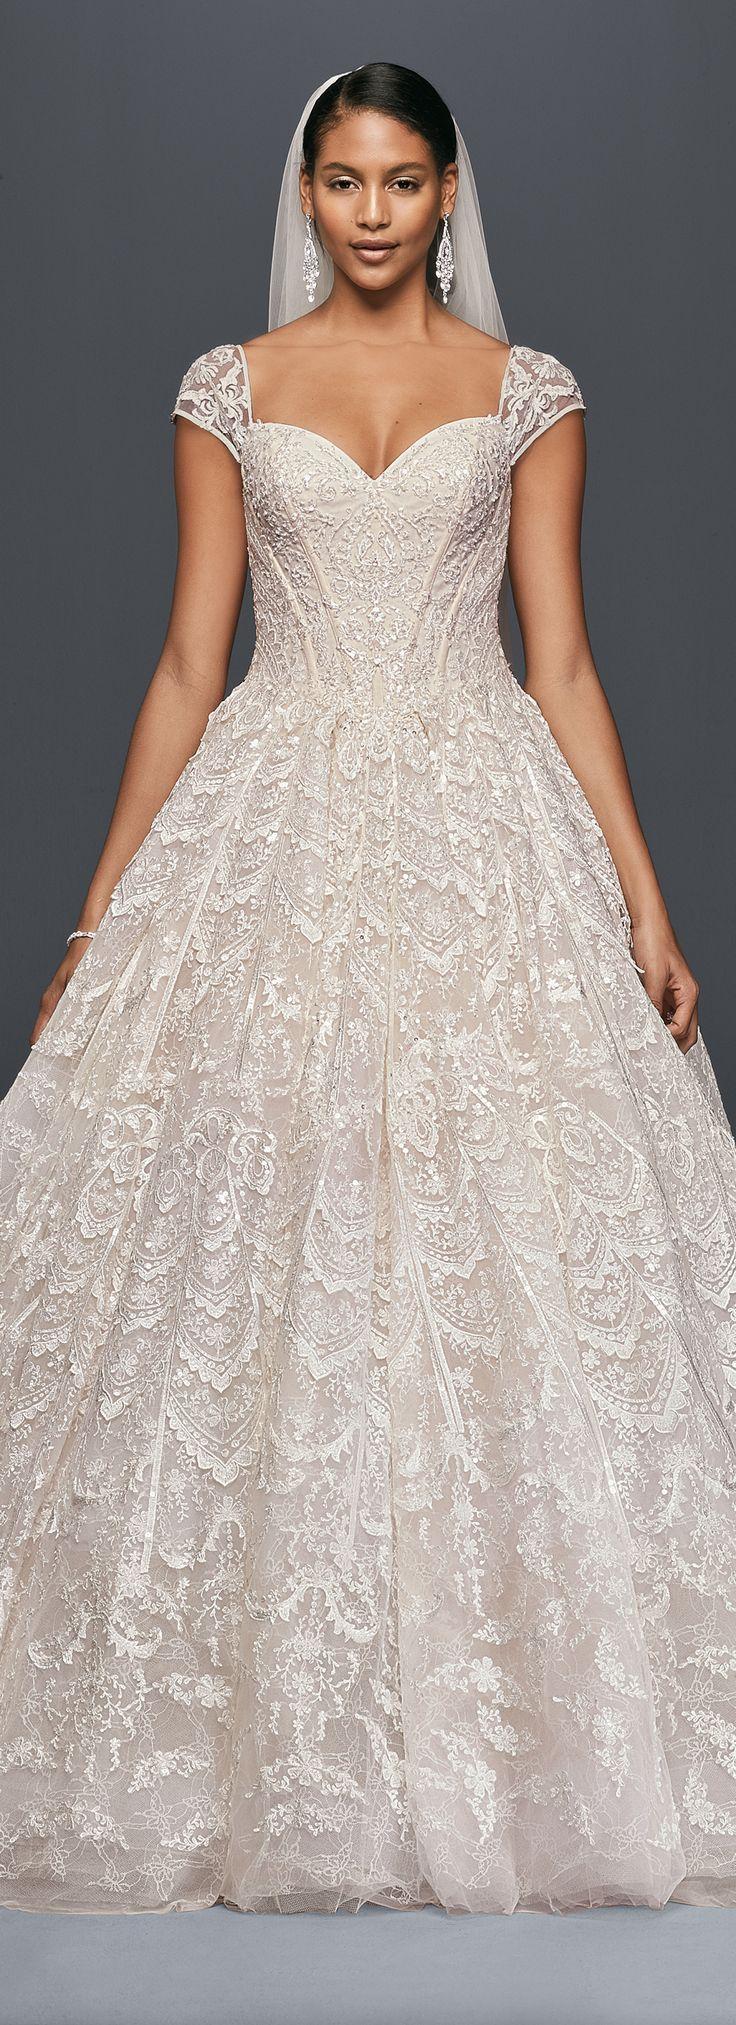 David's Bridal Spring 2017 Wedding Dress   Grand Lace Ball Gown with Beaded Cap Sleeves    #davidsbridal #OlegCassini #ad